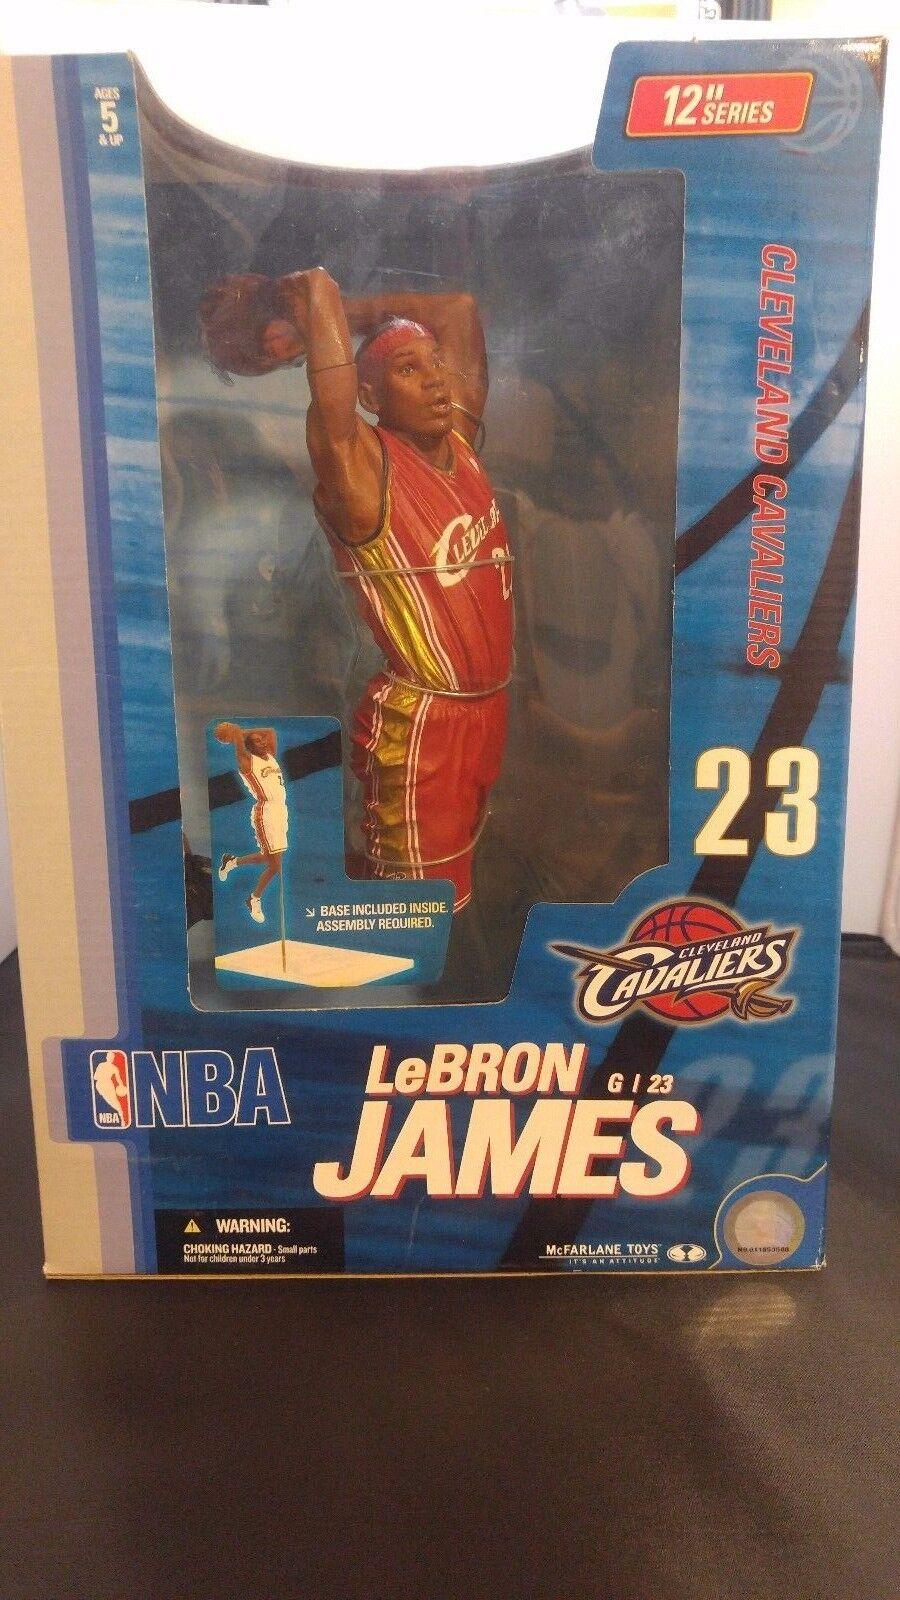 NIB McFarlane LeBRON JAMES CAVS ROOKIE 2004 Red Uniform 2nd NBA 12  Figure